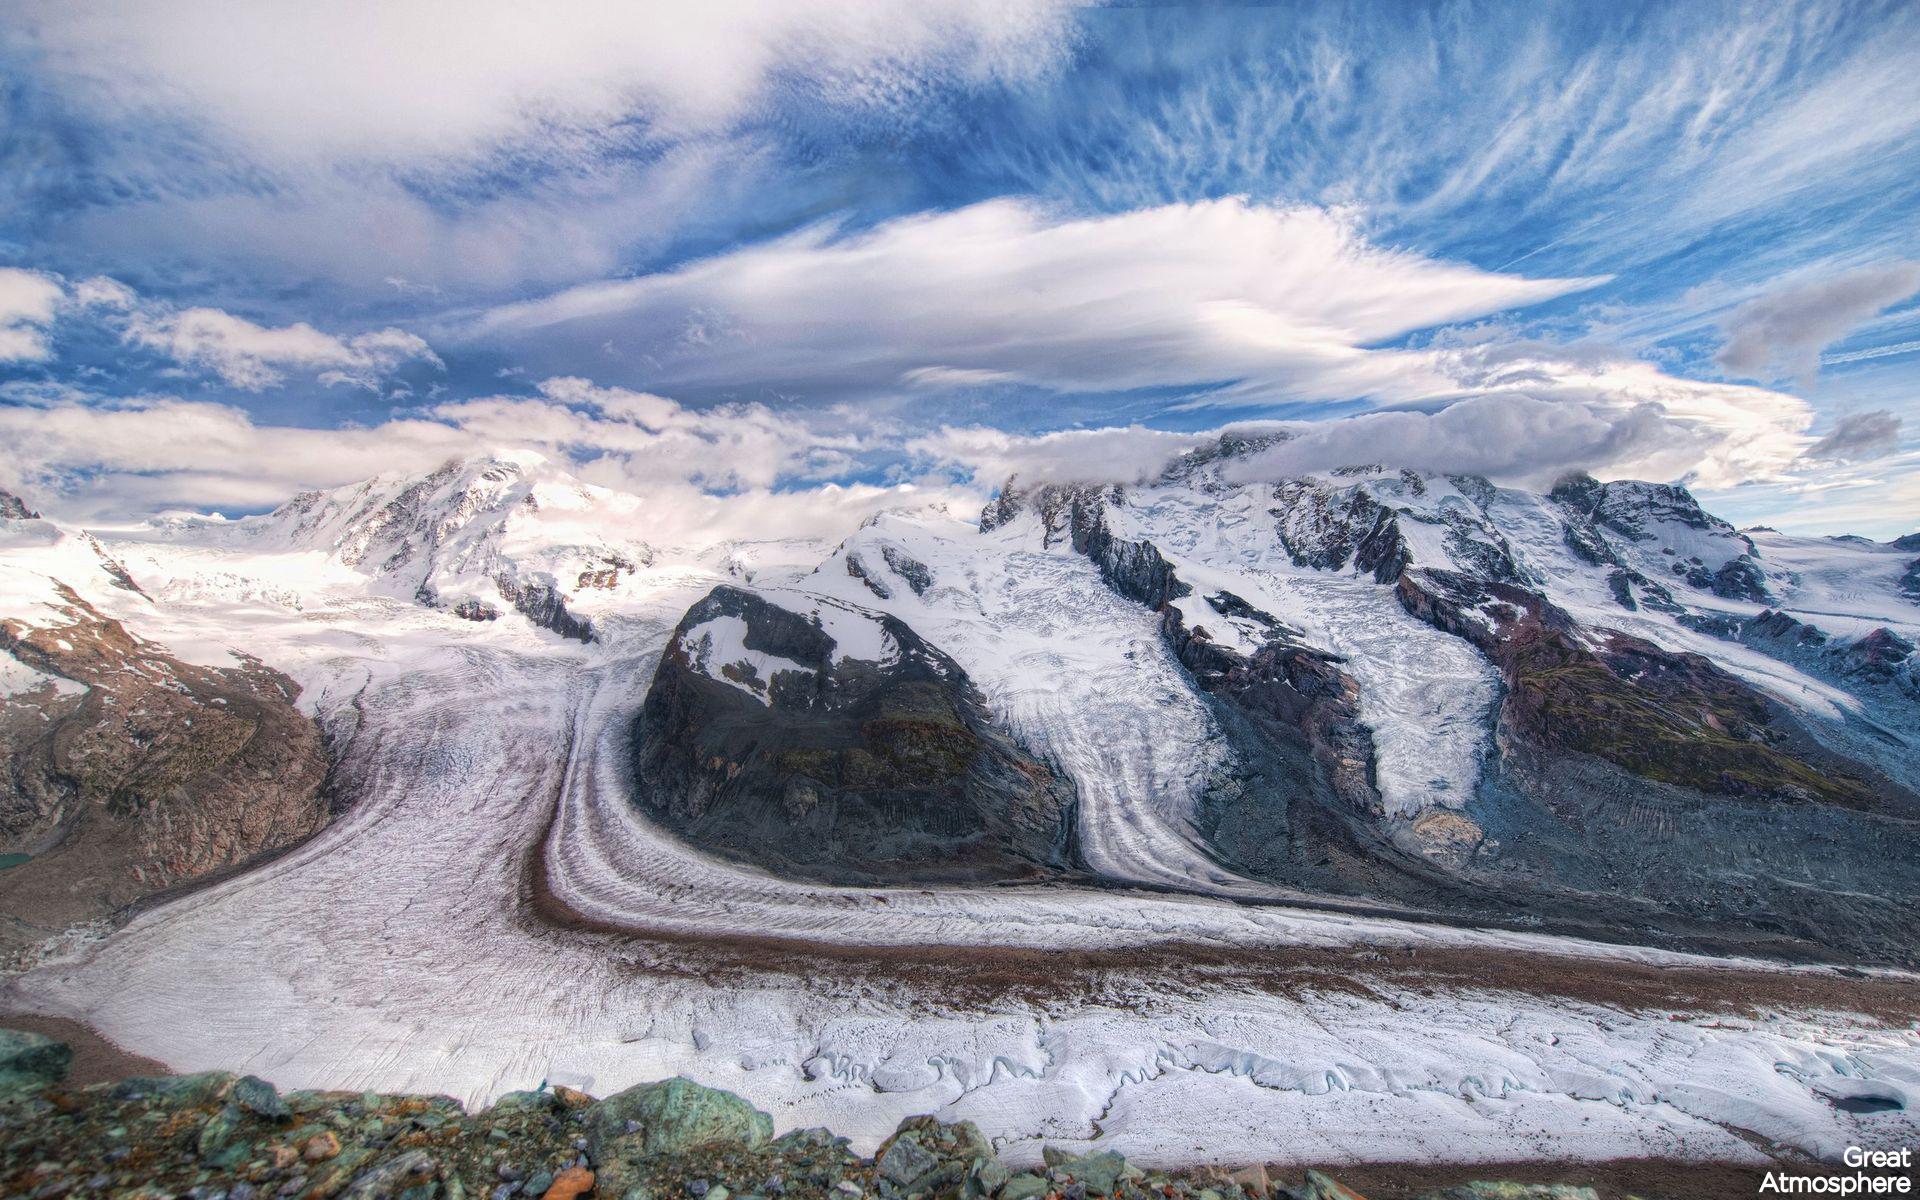 Alps   Great Atmosphere.